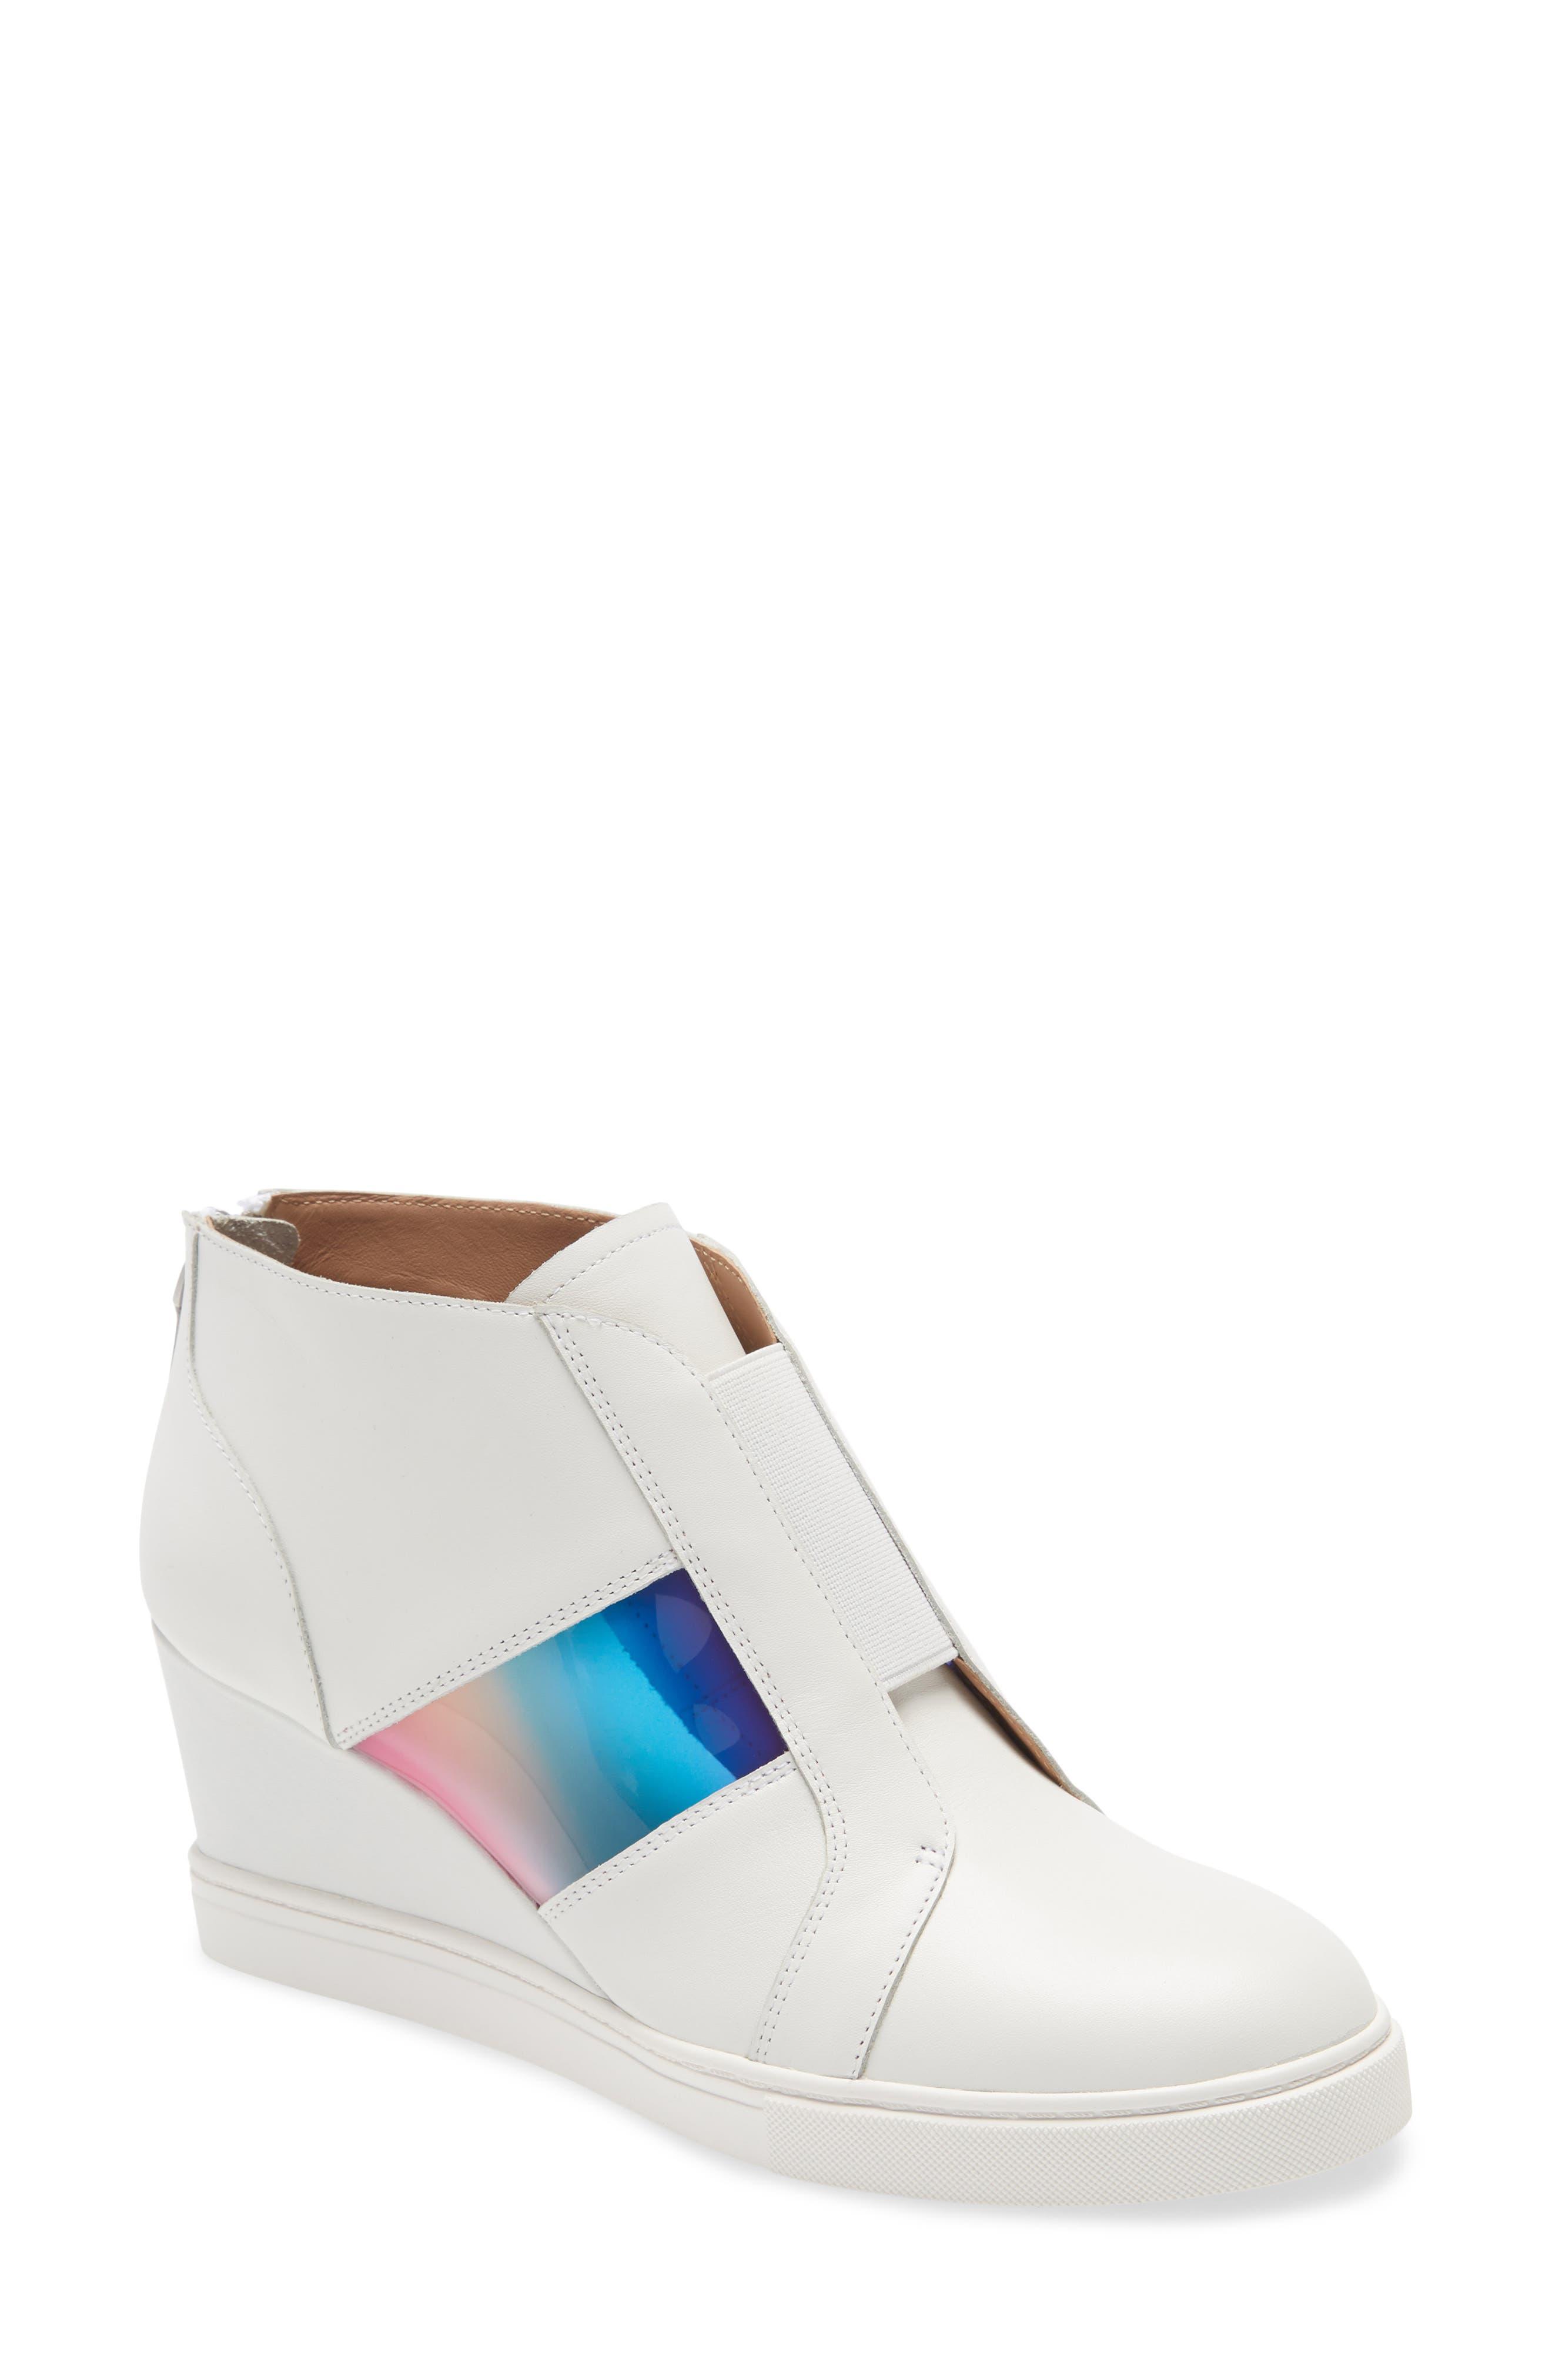 Florent Wedge Sneaker